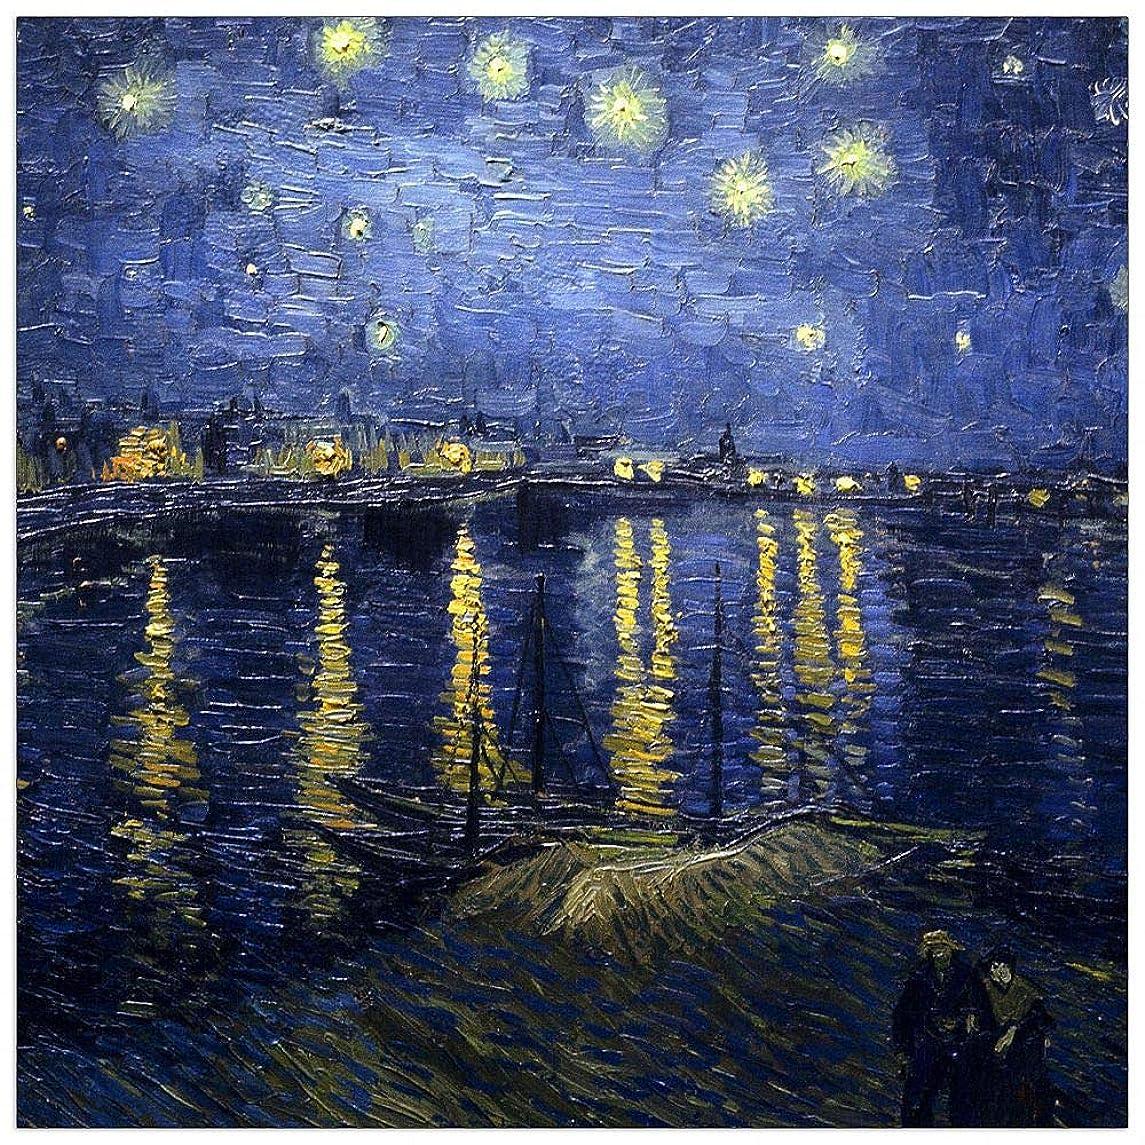 ArtPlaza TW90874 Van Gogh Vincent - Starry Night Over The Rhone Decorative Panel 15.5x15.5 Inch Multicolored